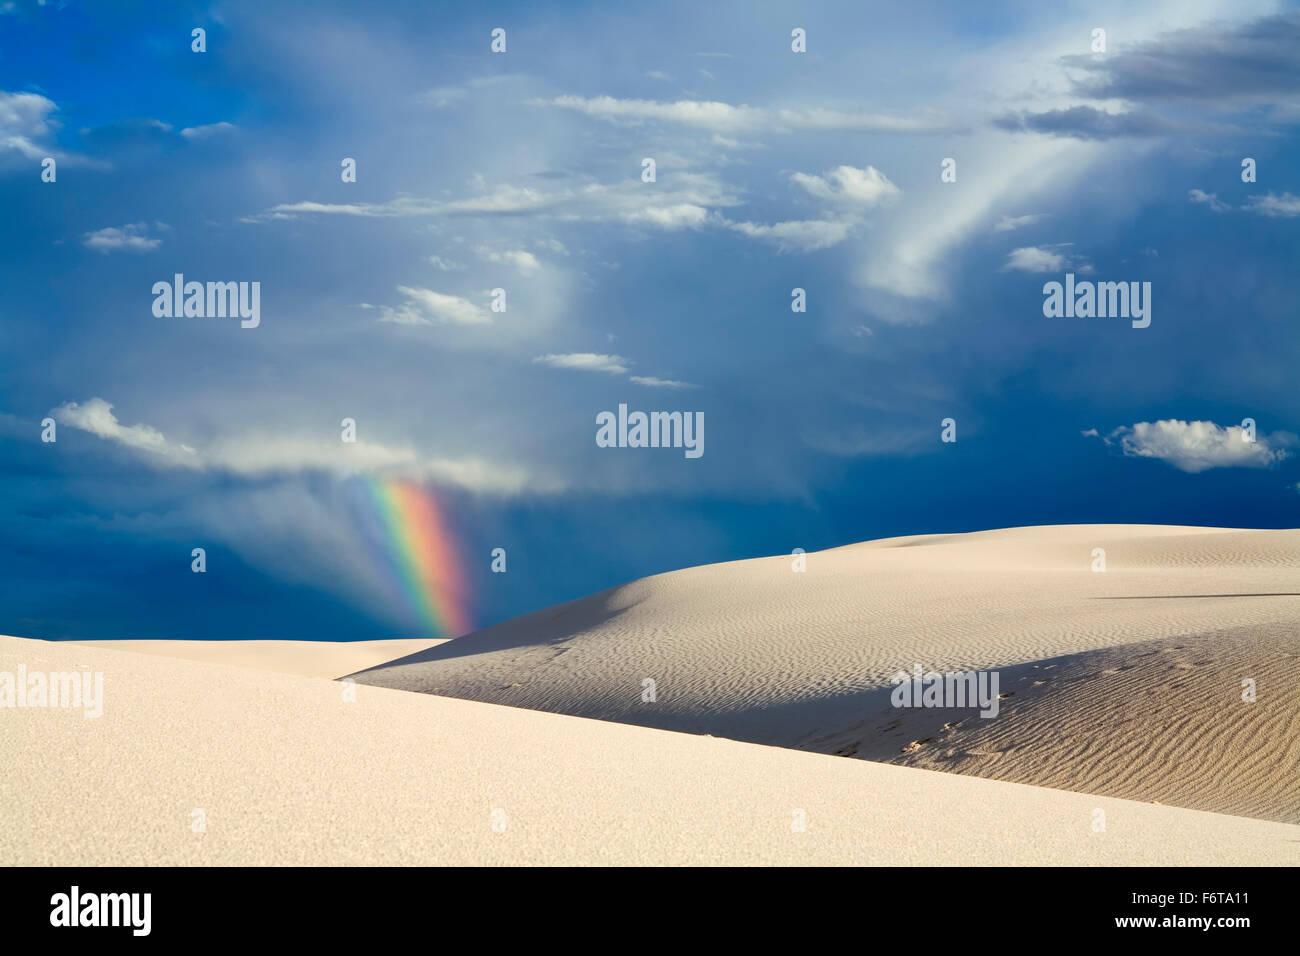 Rainbow over sand dunes, White Sands National Monument, Alamogordo, New Mexico USA - Stock Image